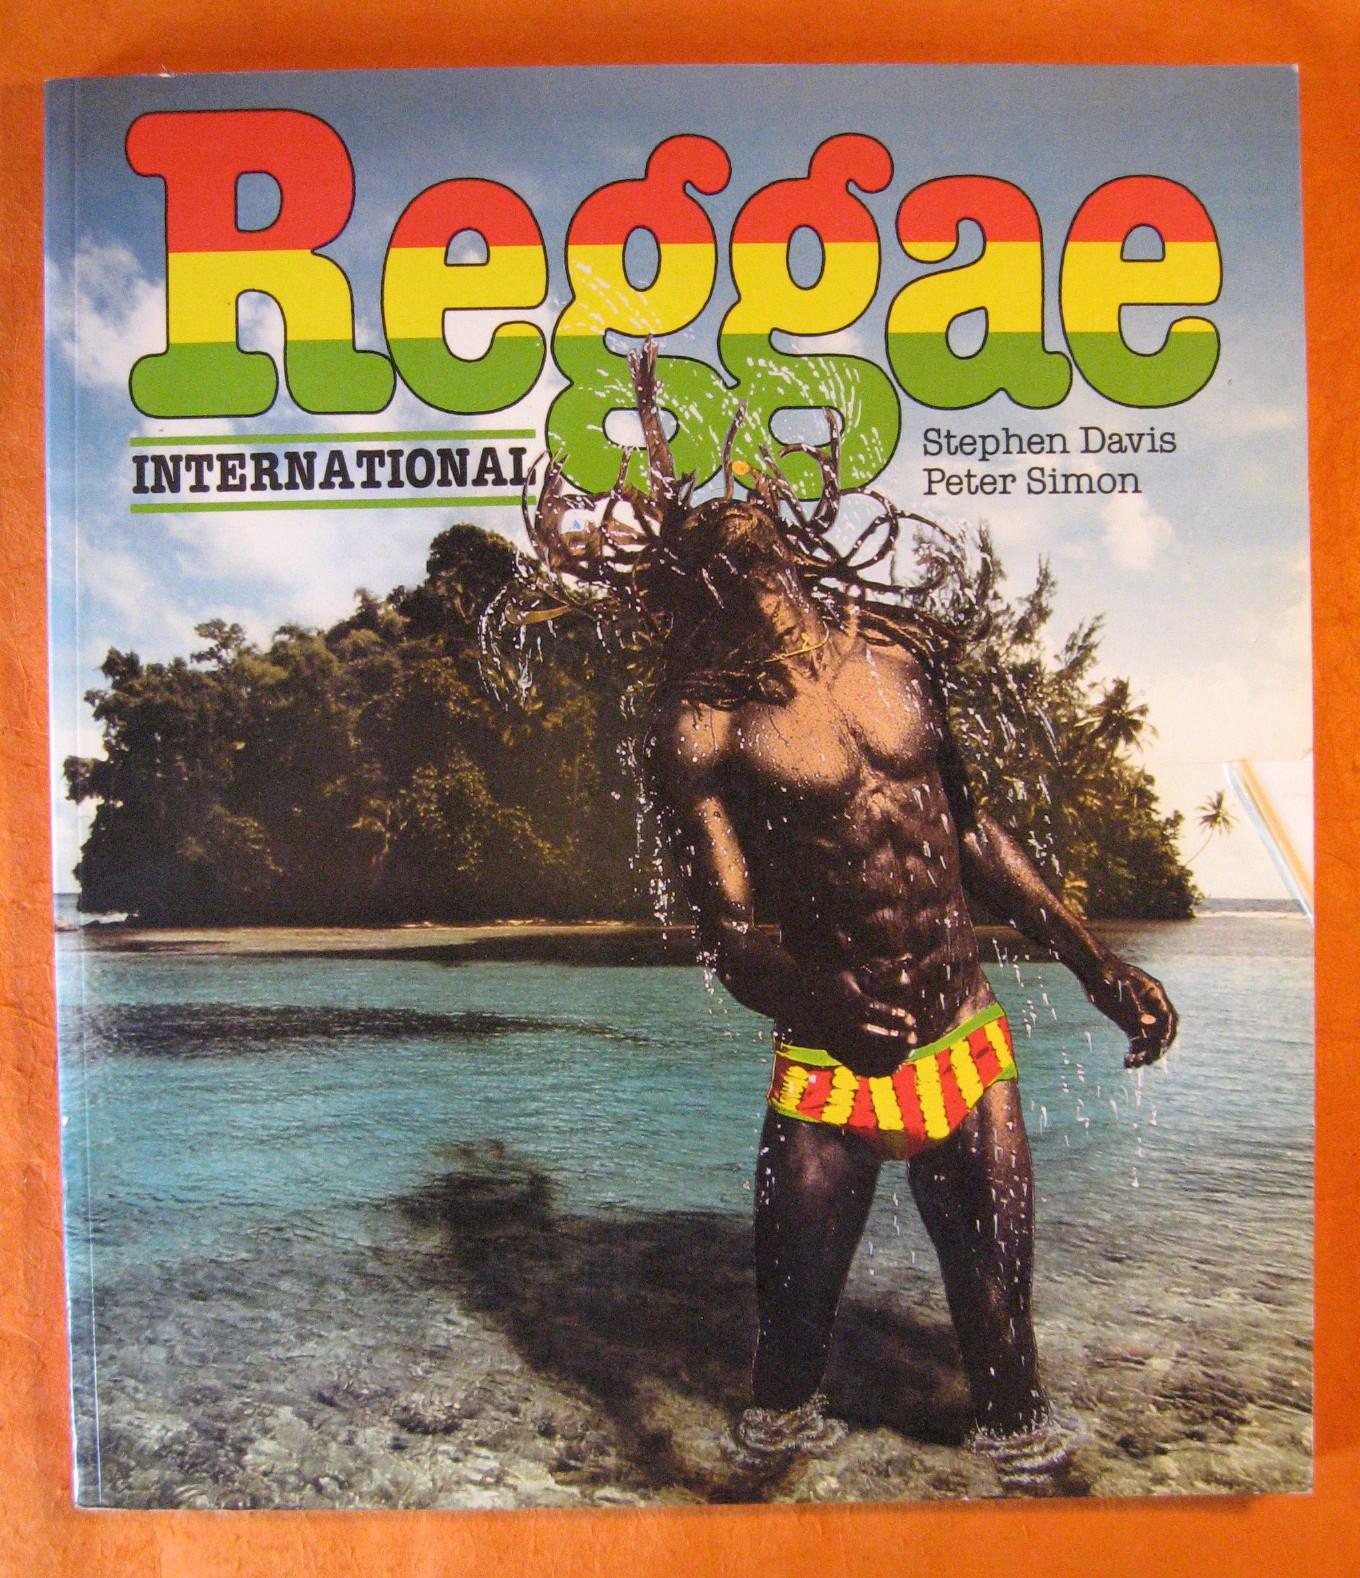 Reggae International, Davis, Stephen ; Peter Simon